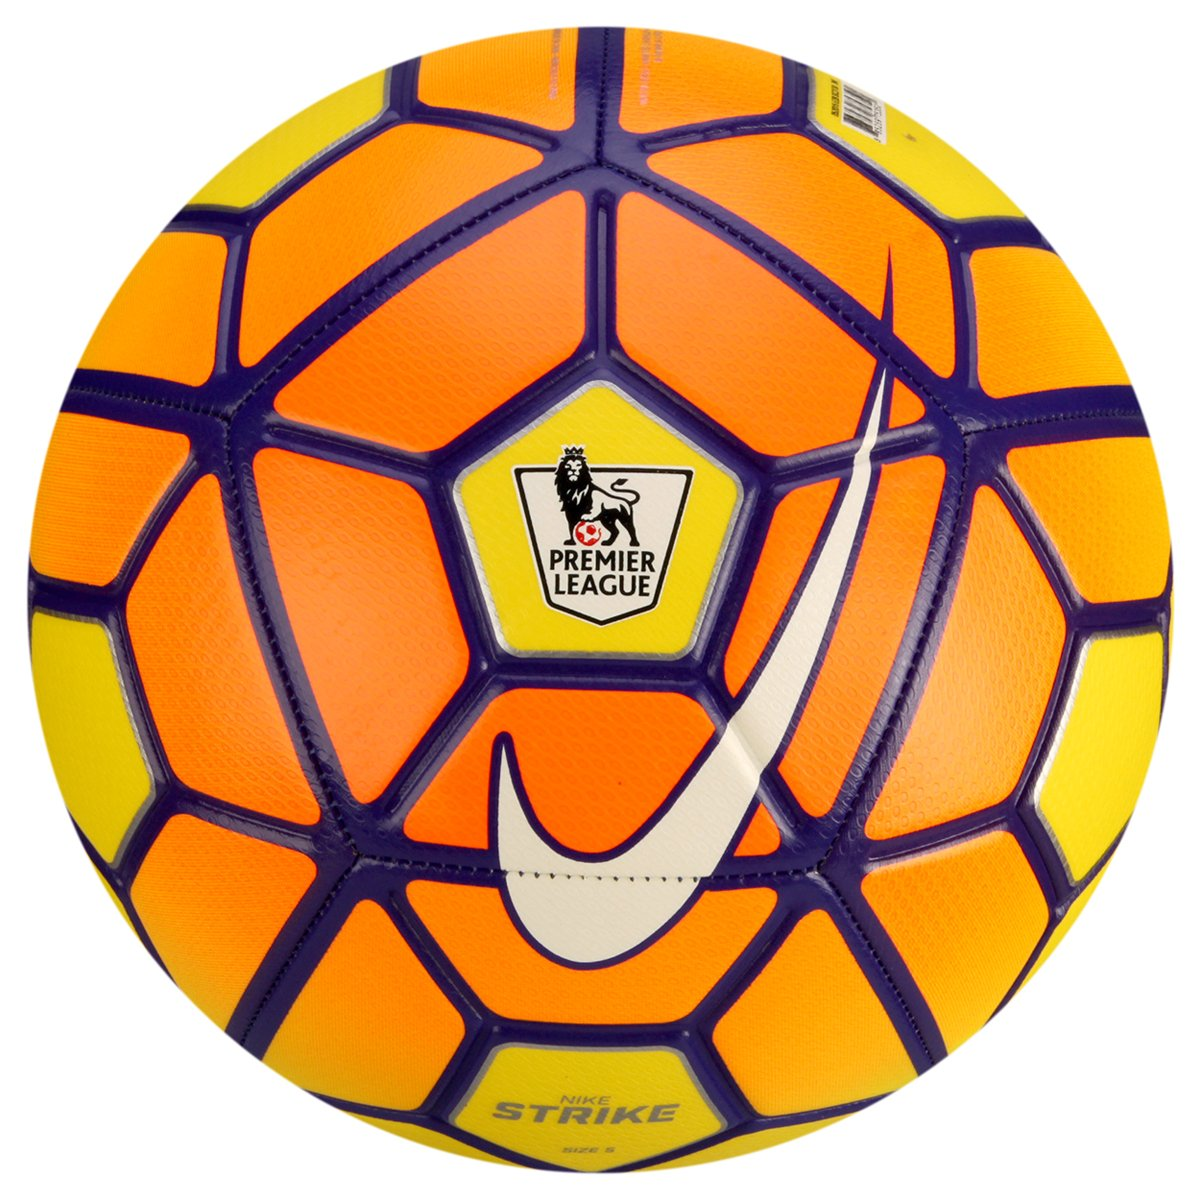 b34f7403b9 Bola Futebol Nike Strike PL - Compre Agora